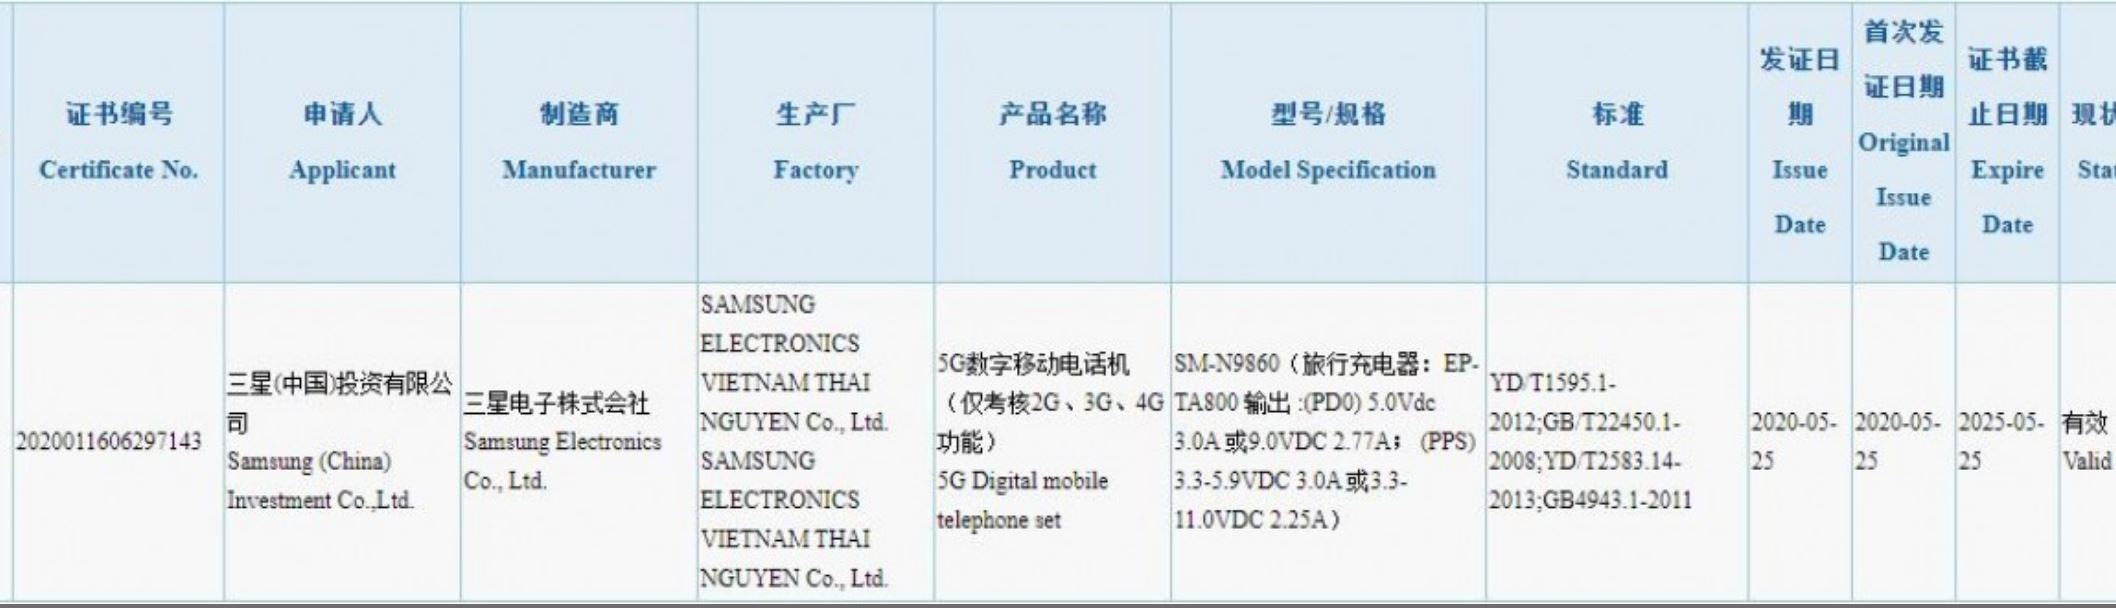 Samsung GALAXY Note 20 Plus certificare oficiala